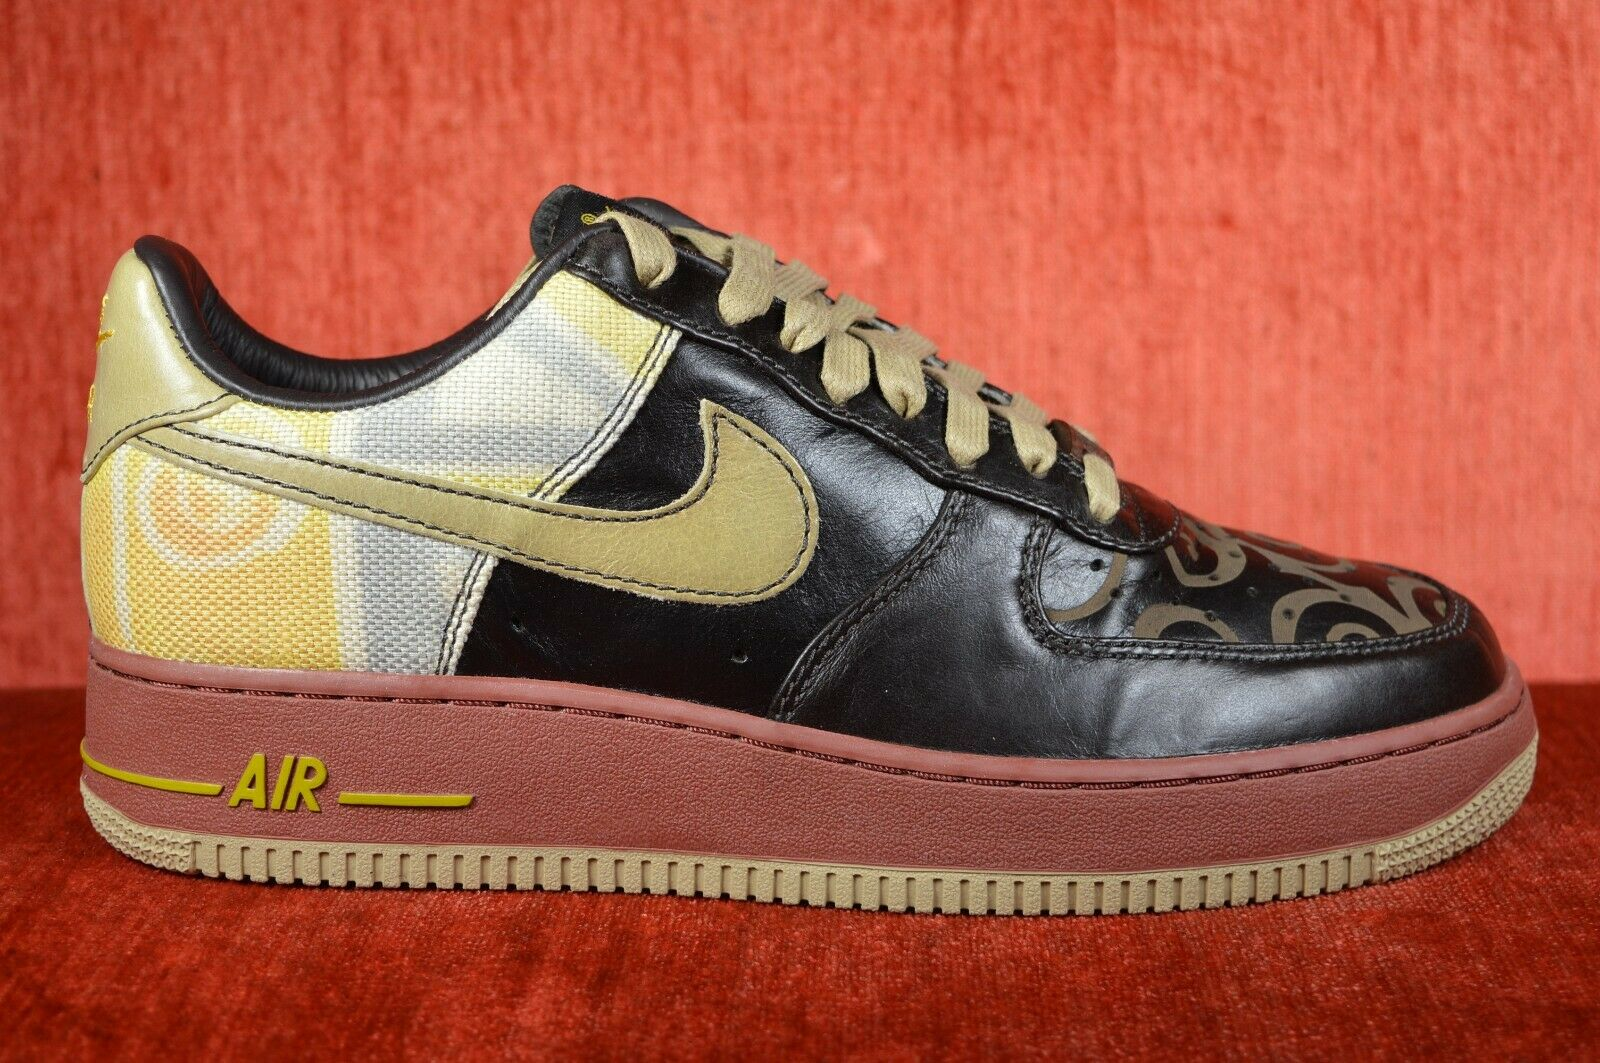 NEW Nike Air Force 1 Low Premium BHM Black Size 9 315180-021 Promo Sample Leathe